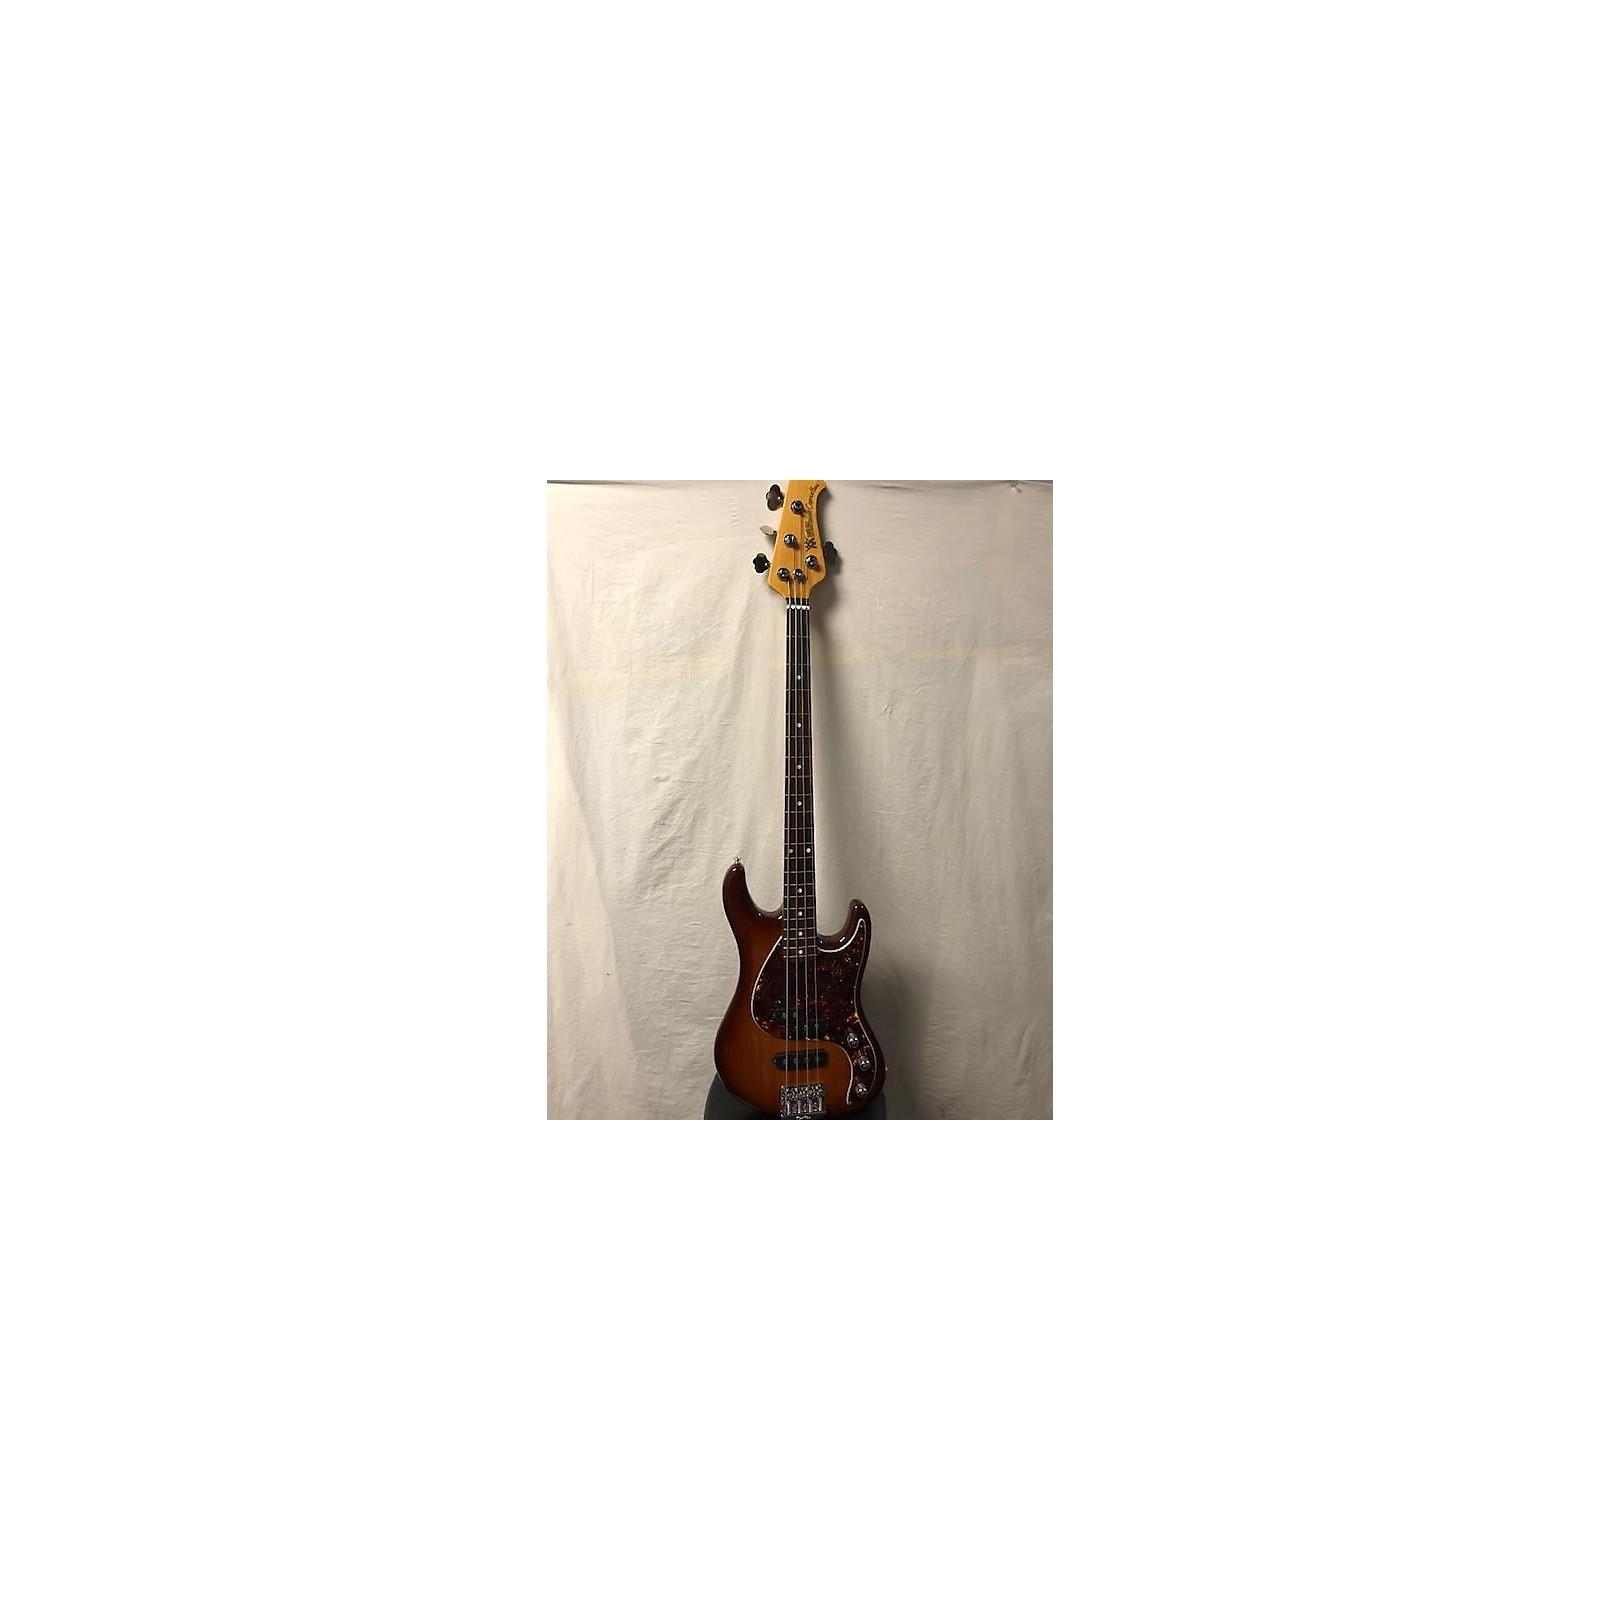 Ernie Ball Music Man Caprice Electric Bass Guitar